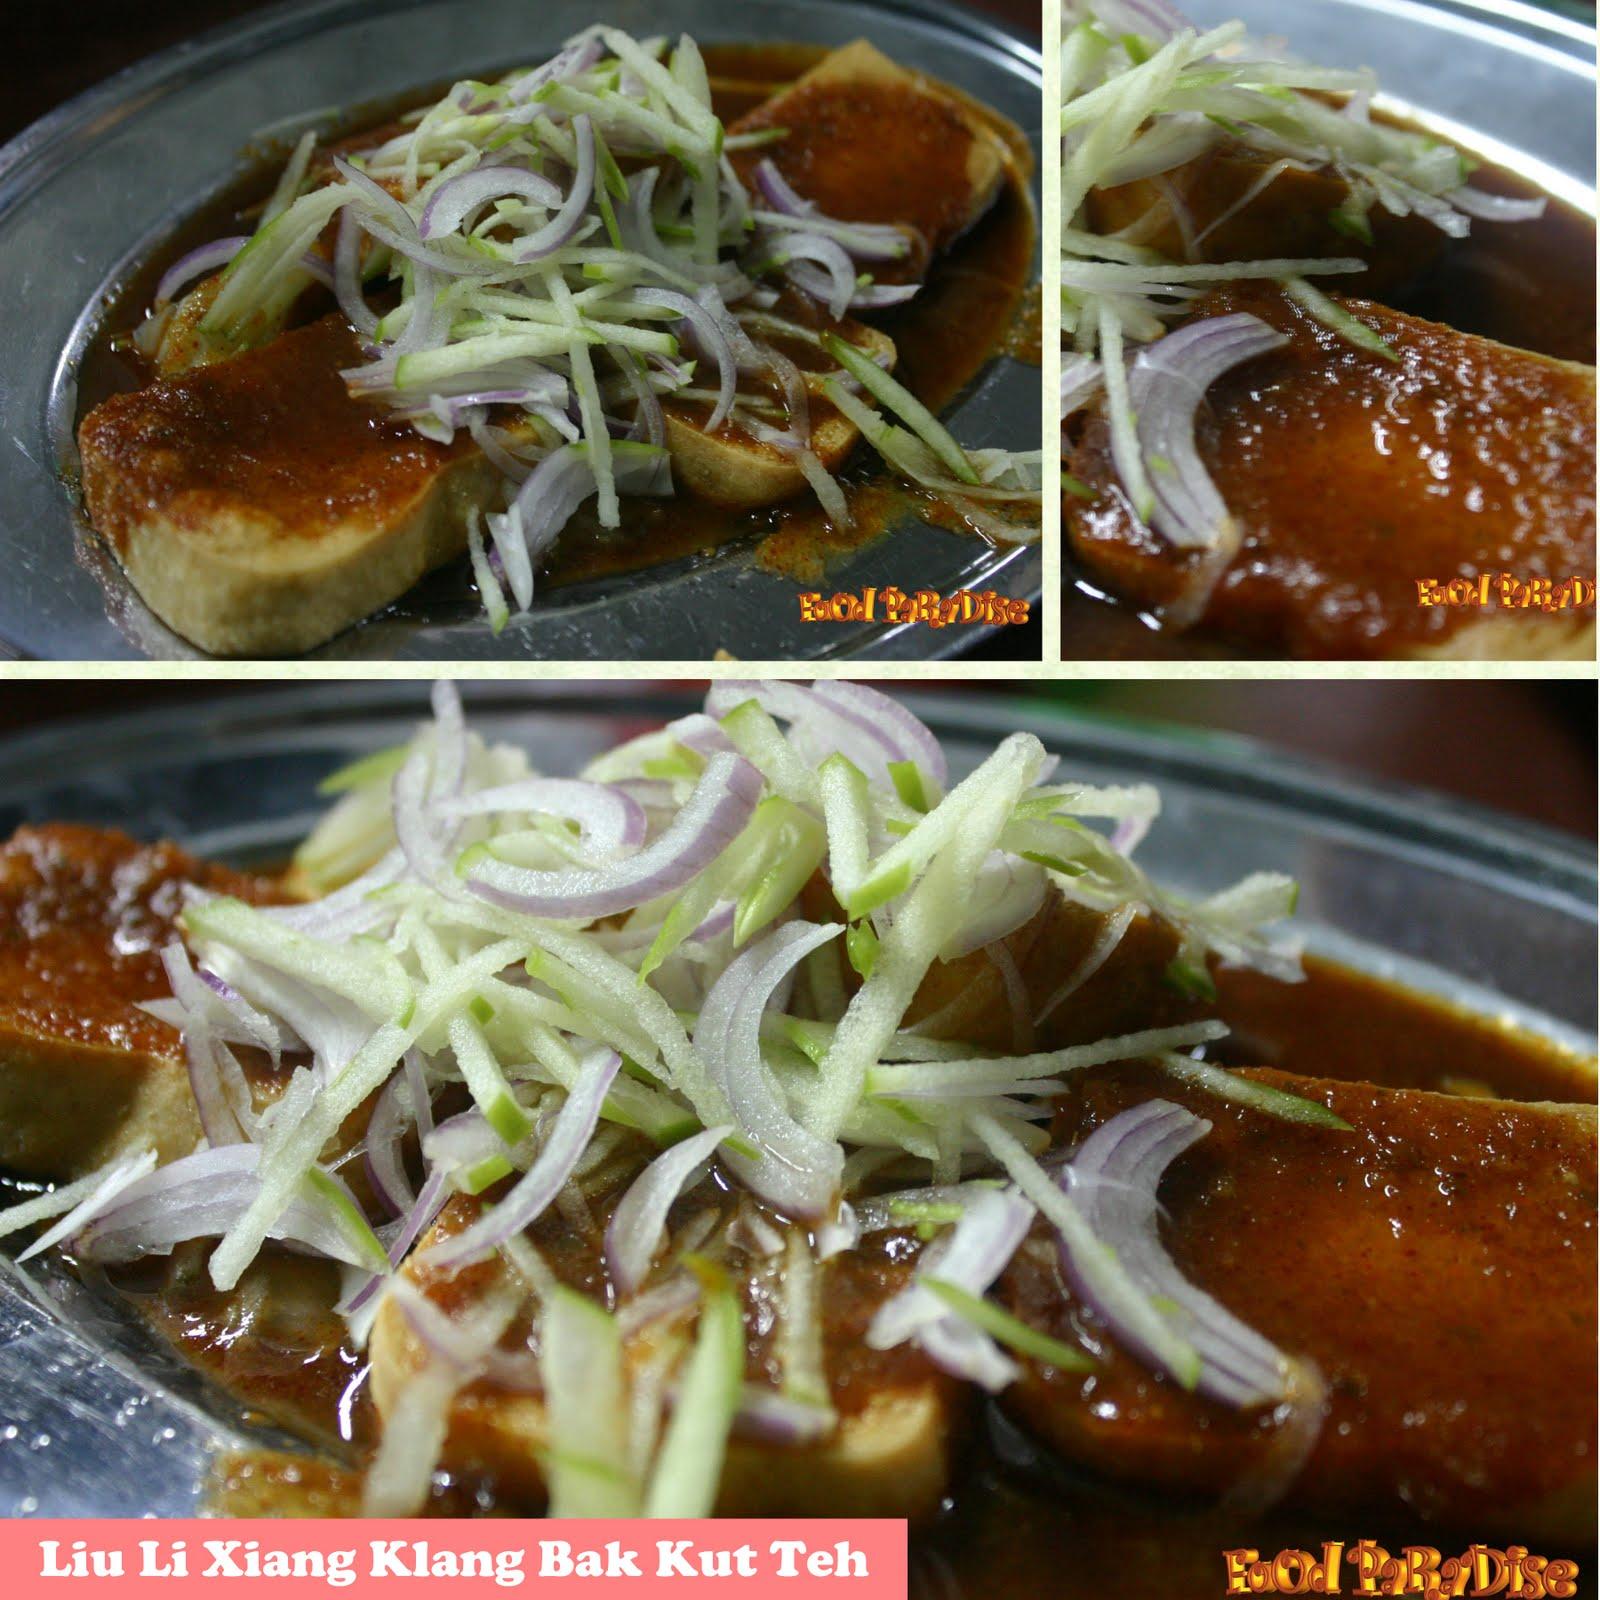 Food paradise liu li xiang klang bak kut teh gottlieb for Cuisine xiang